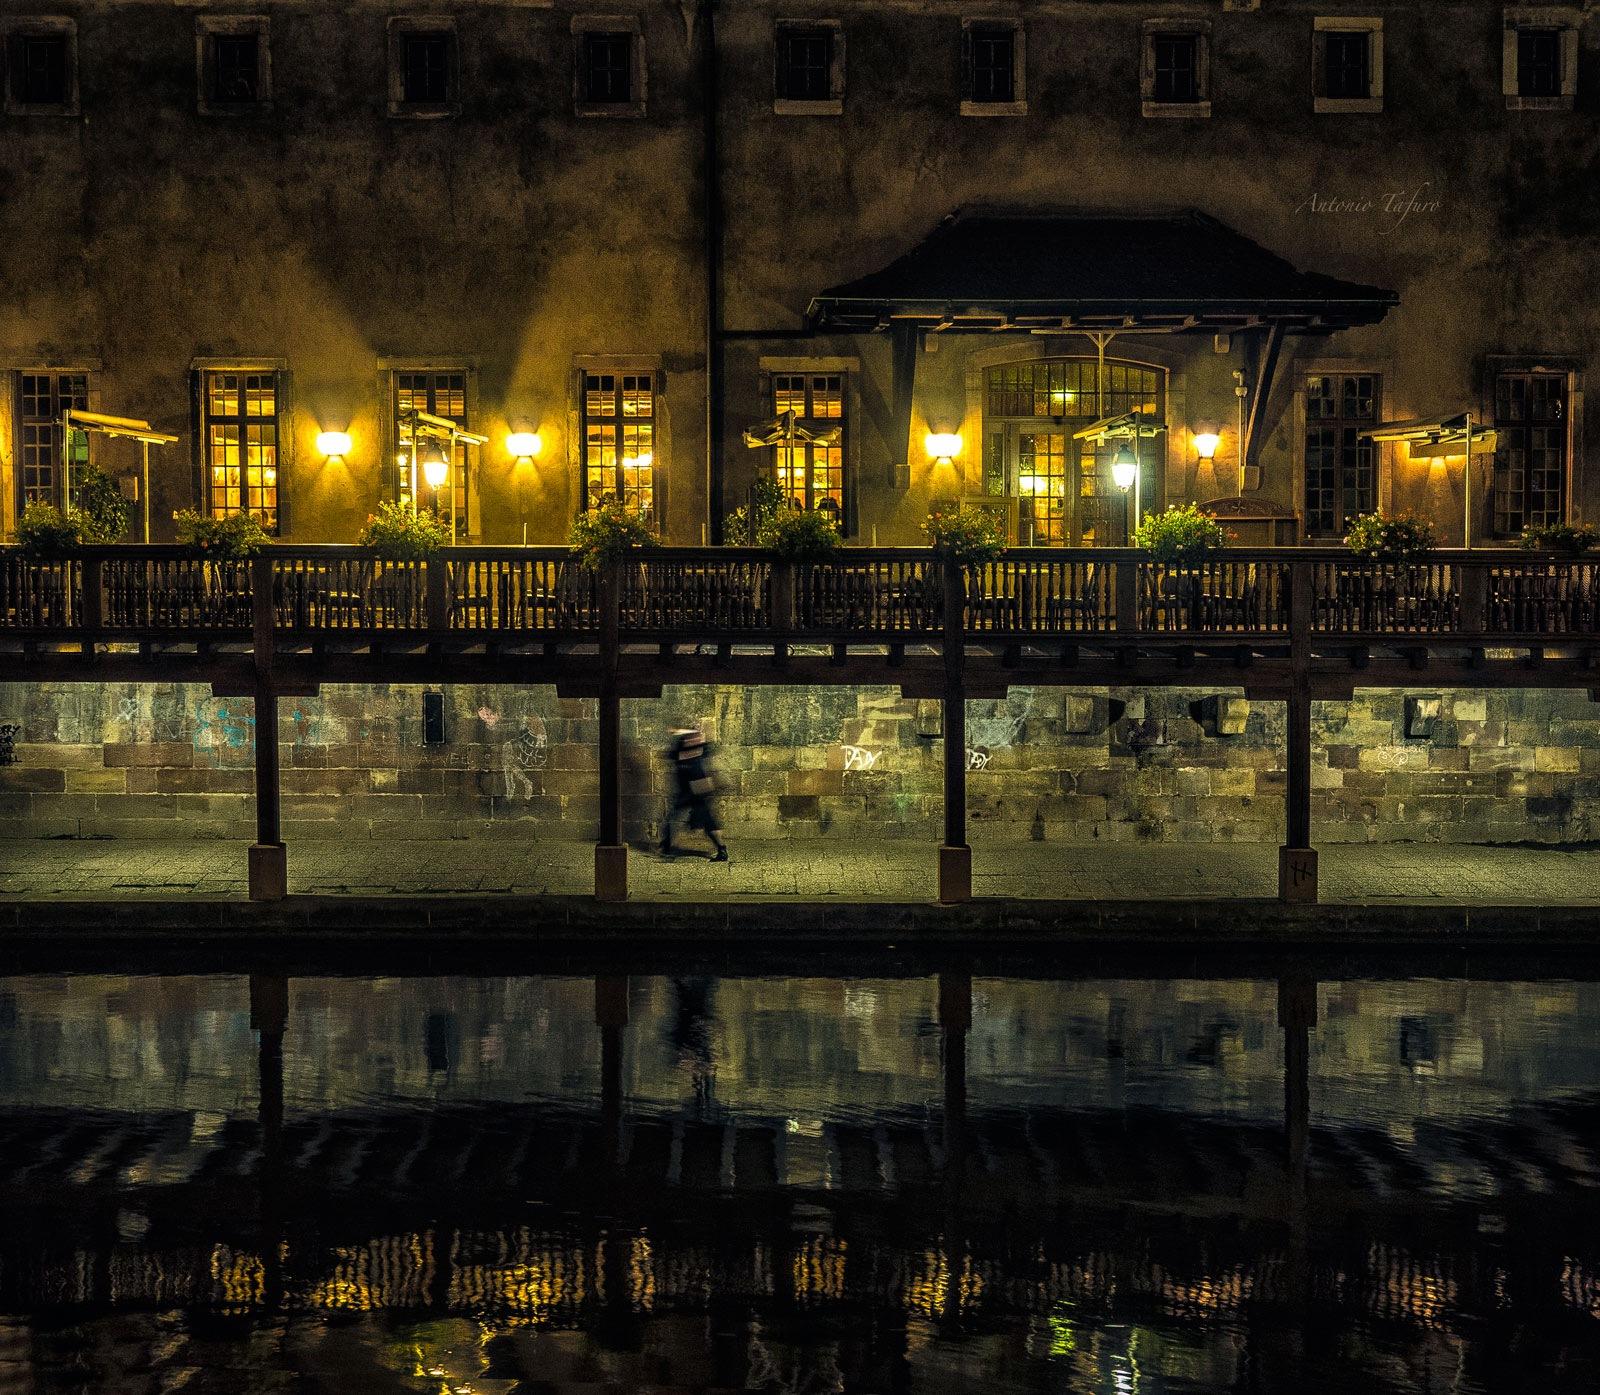 lights and shadows of the night by Antonio Tafuro